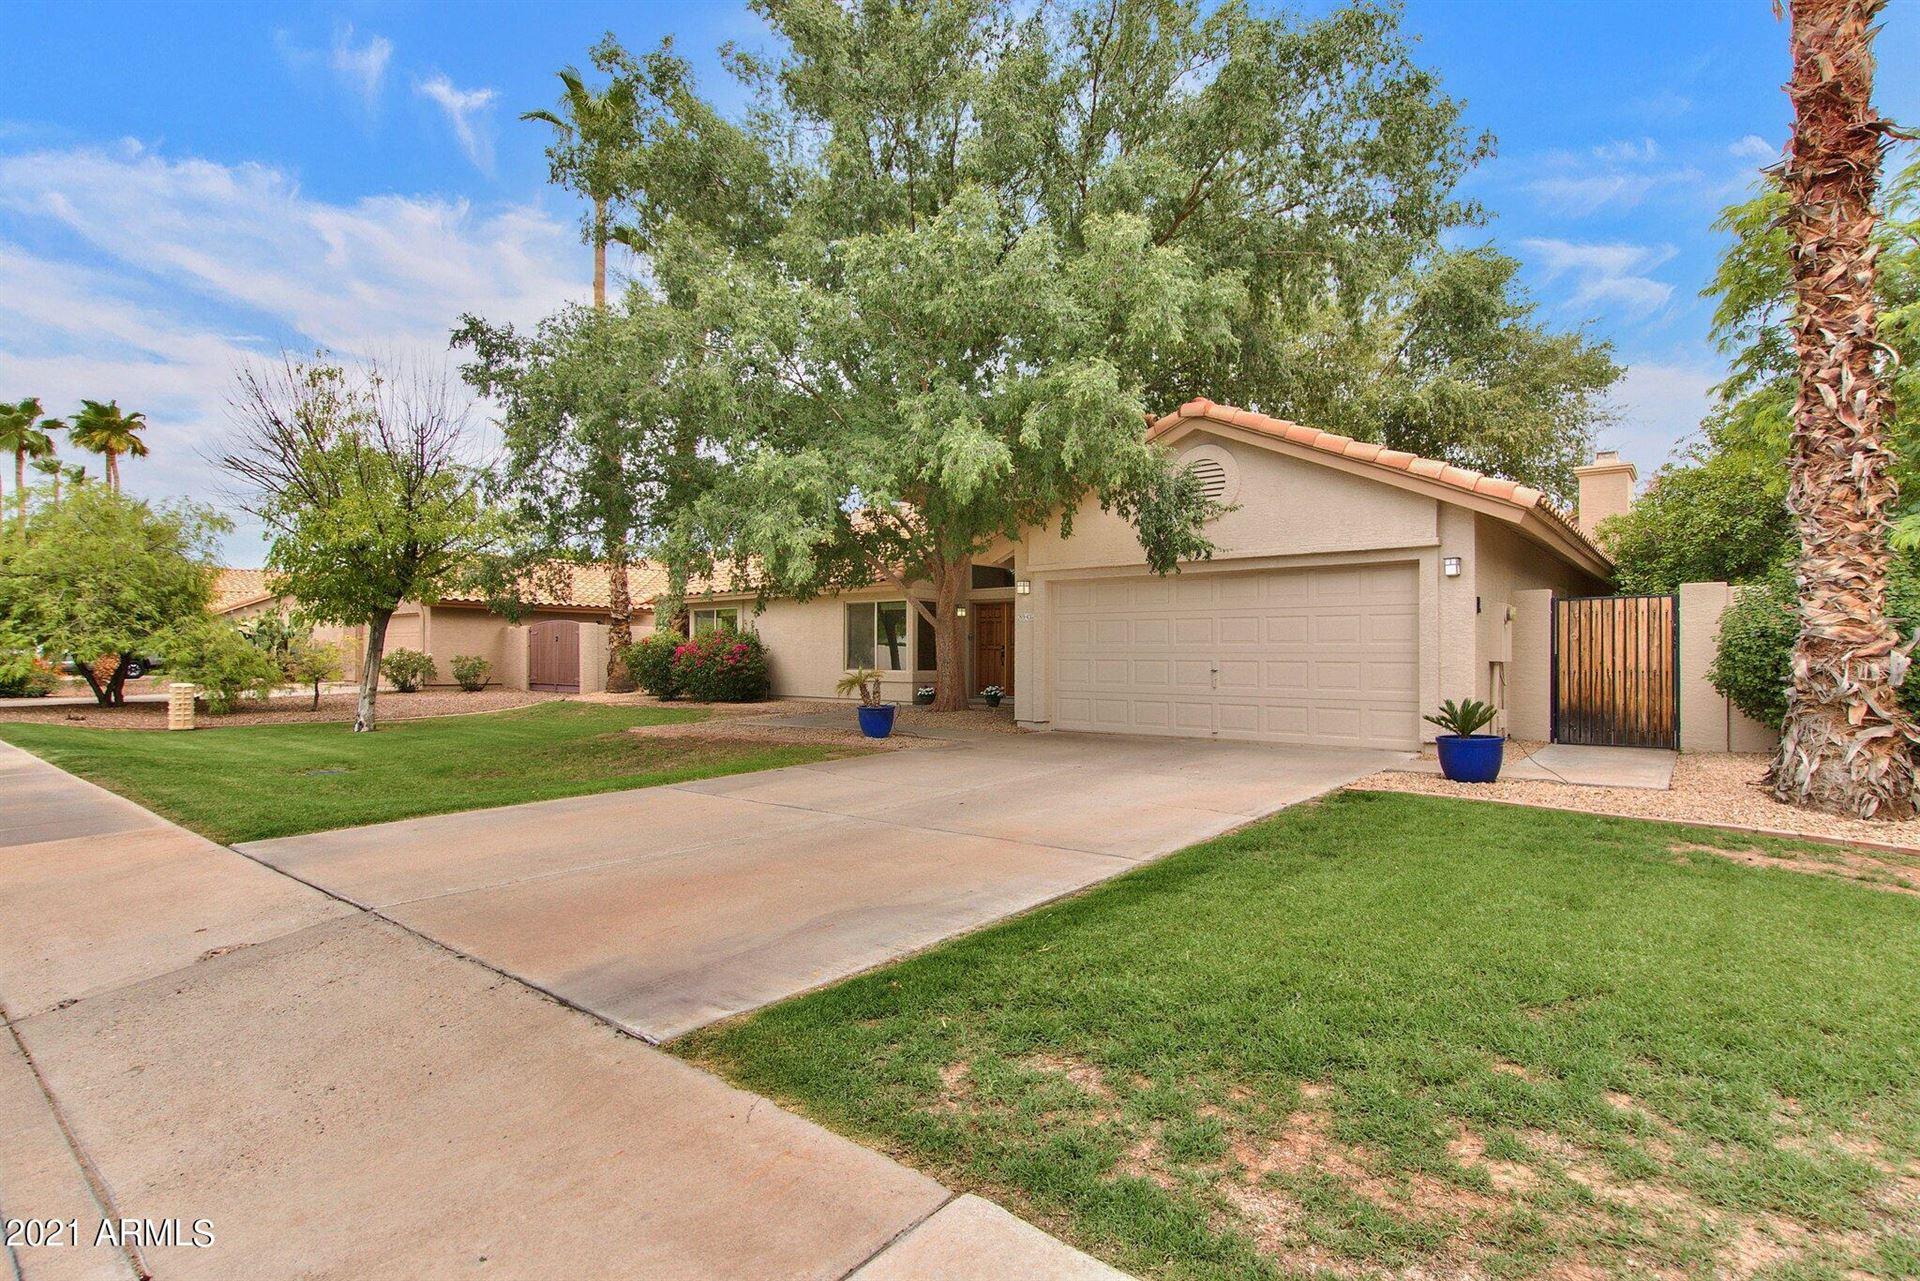 Photo of 8943 S DATELAND Drive, Tempe, AZ 85284 (MLS # 6272004)